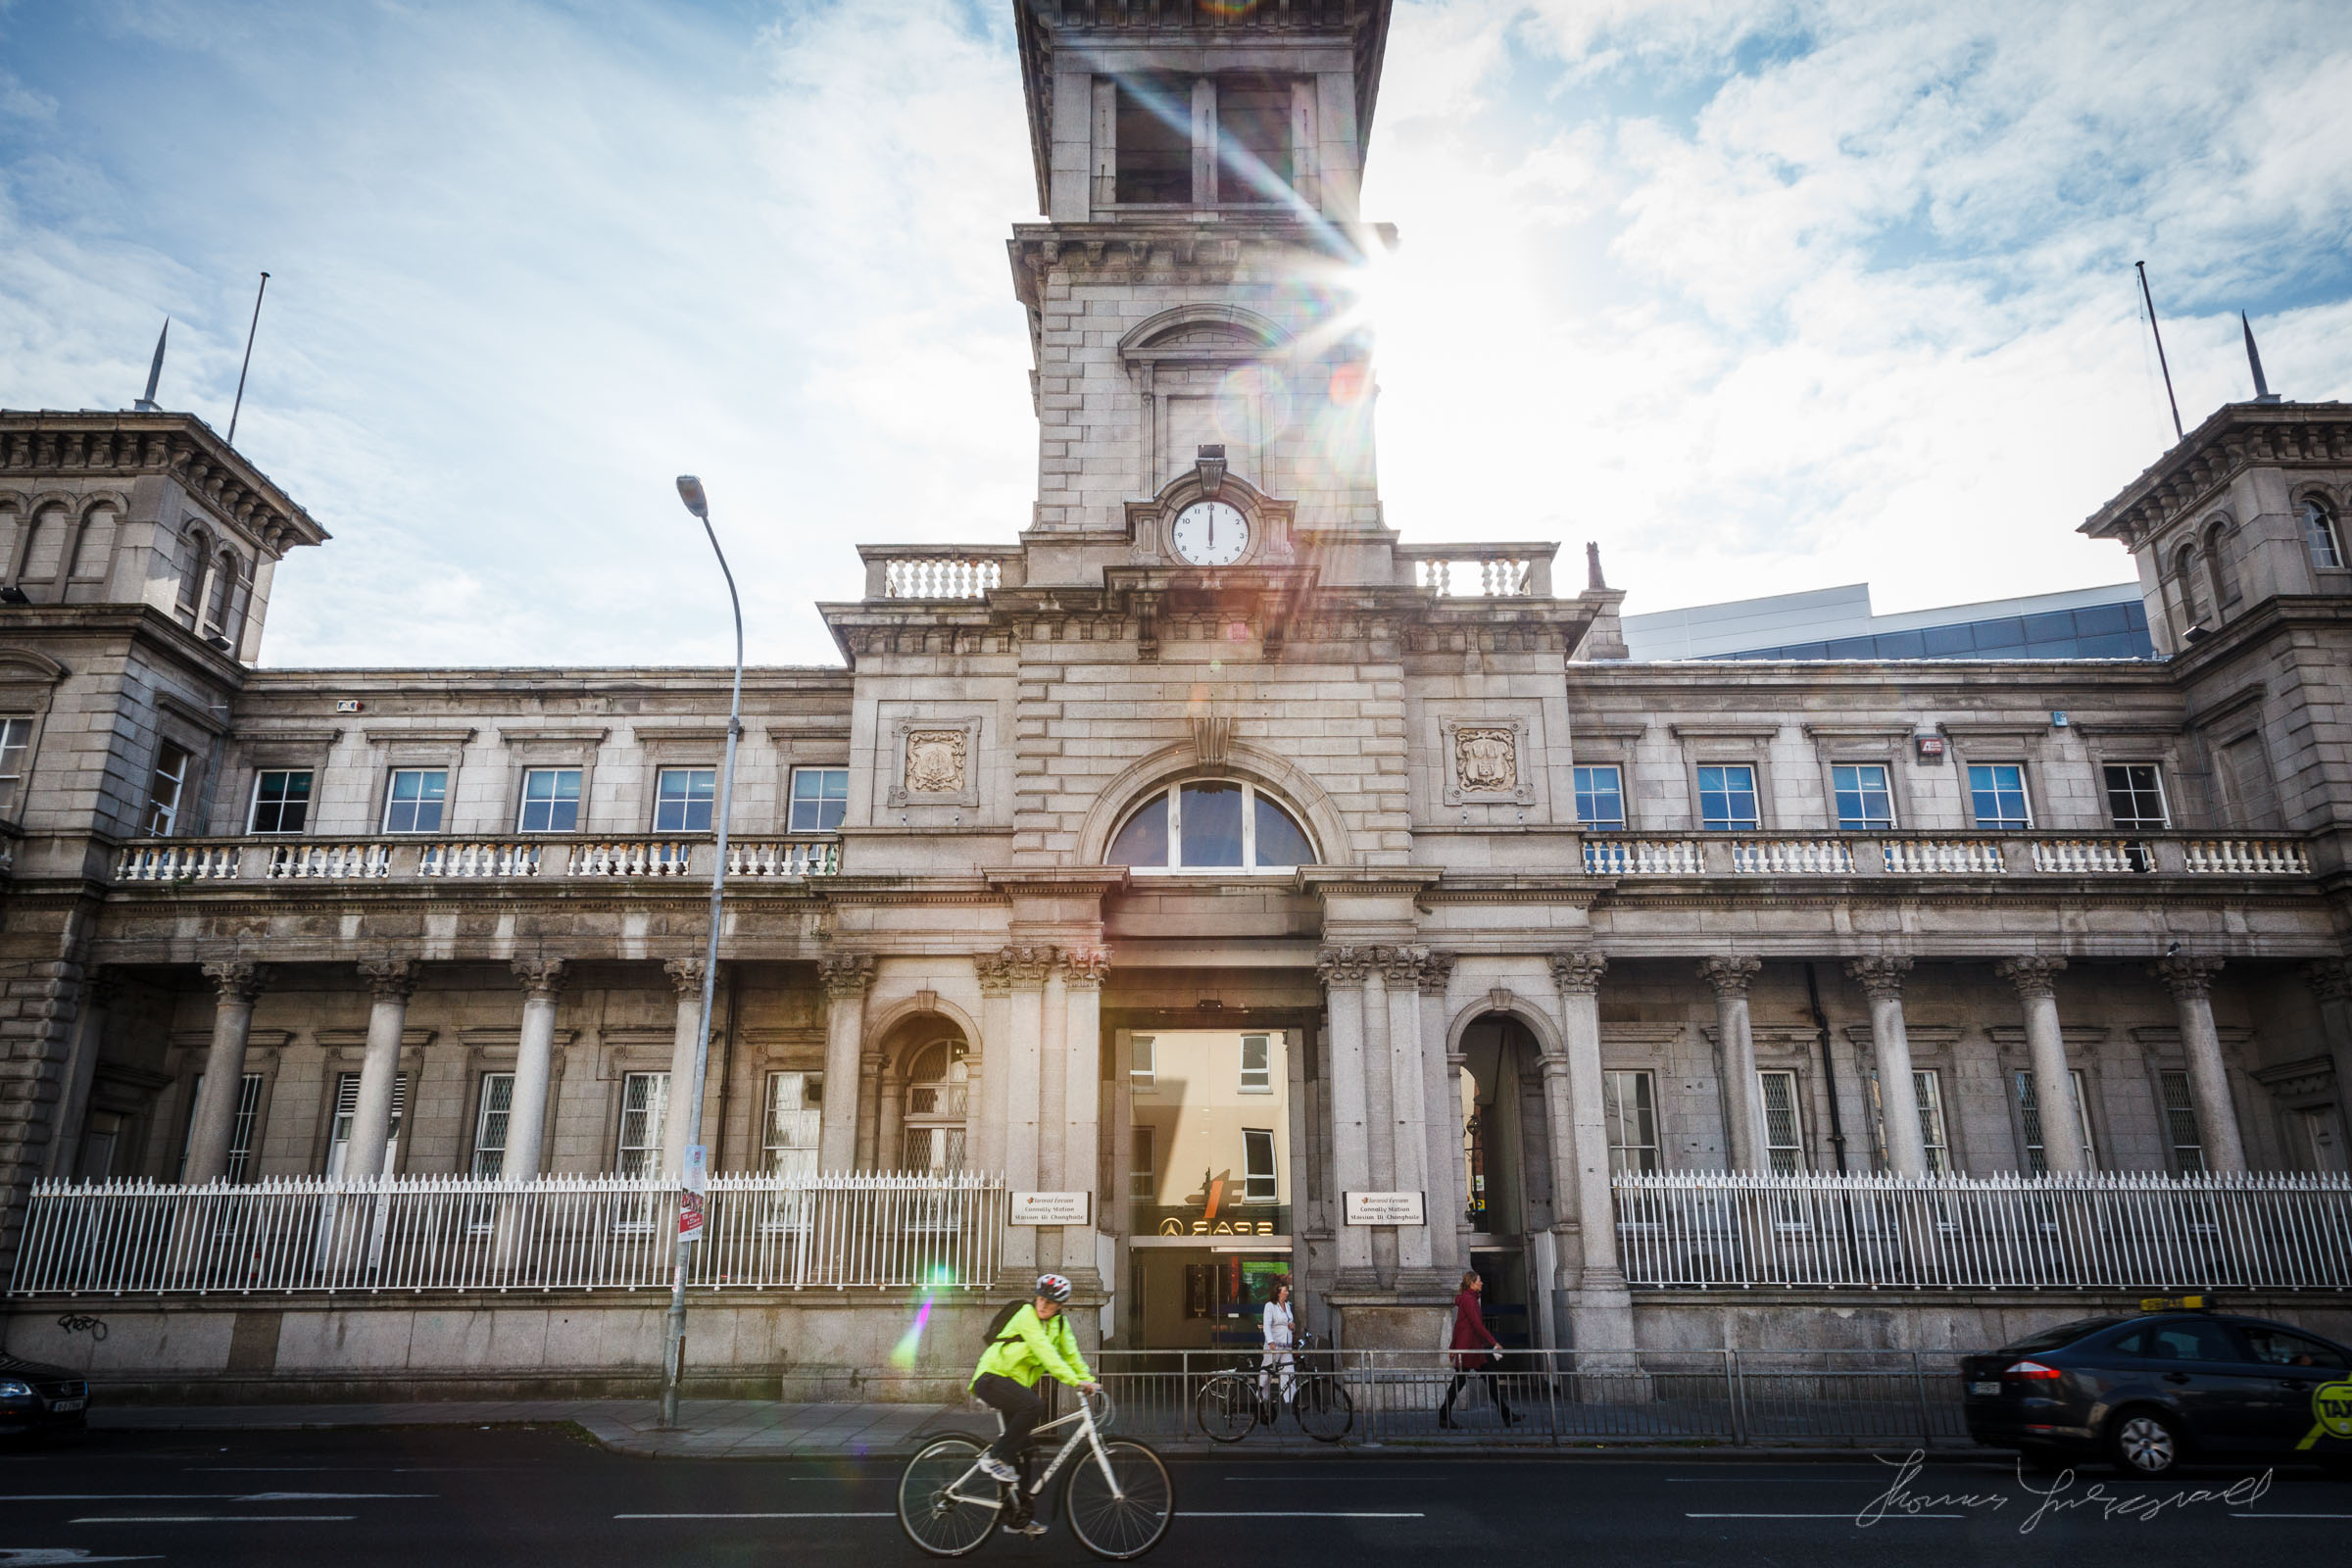 Streets-of-Dublin-Photo-2172.jpg